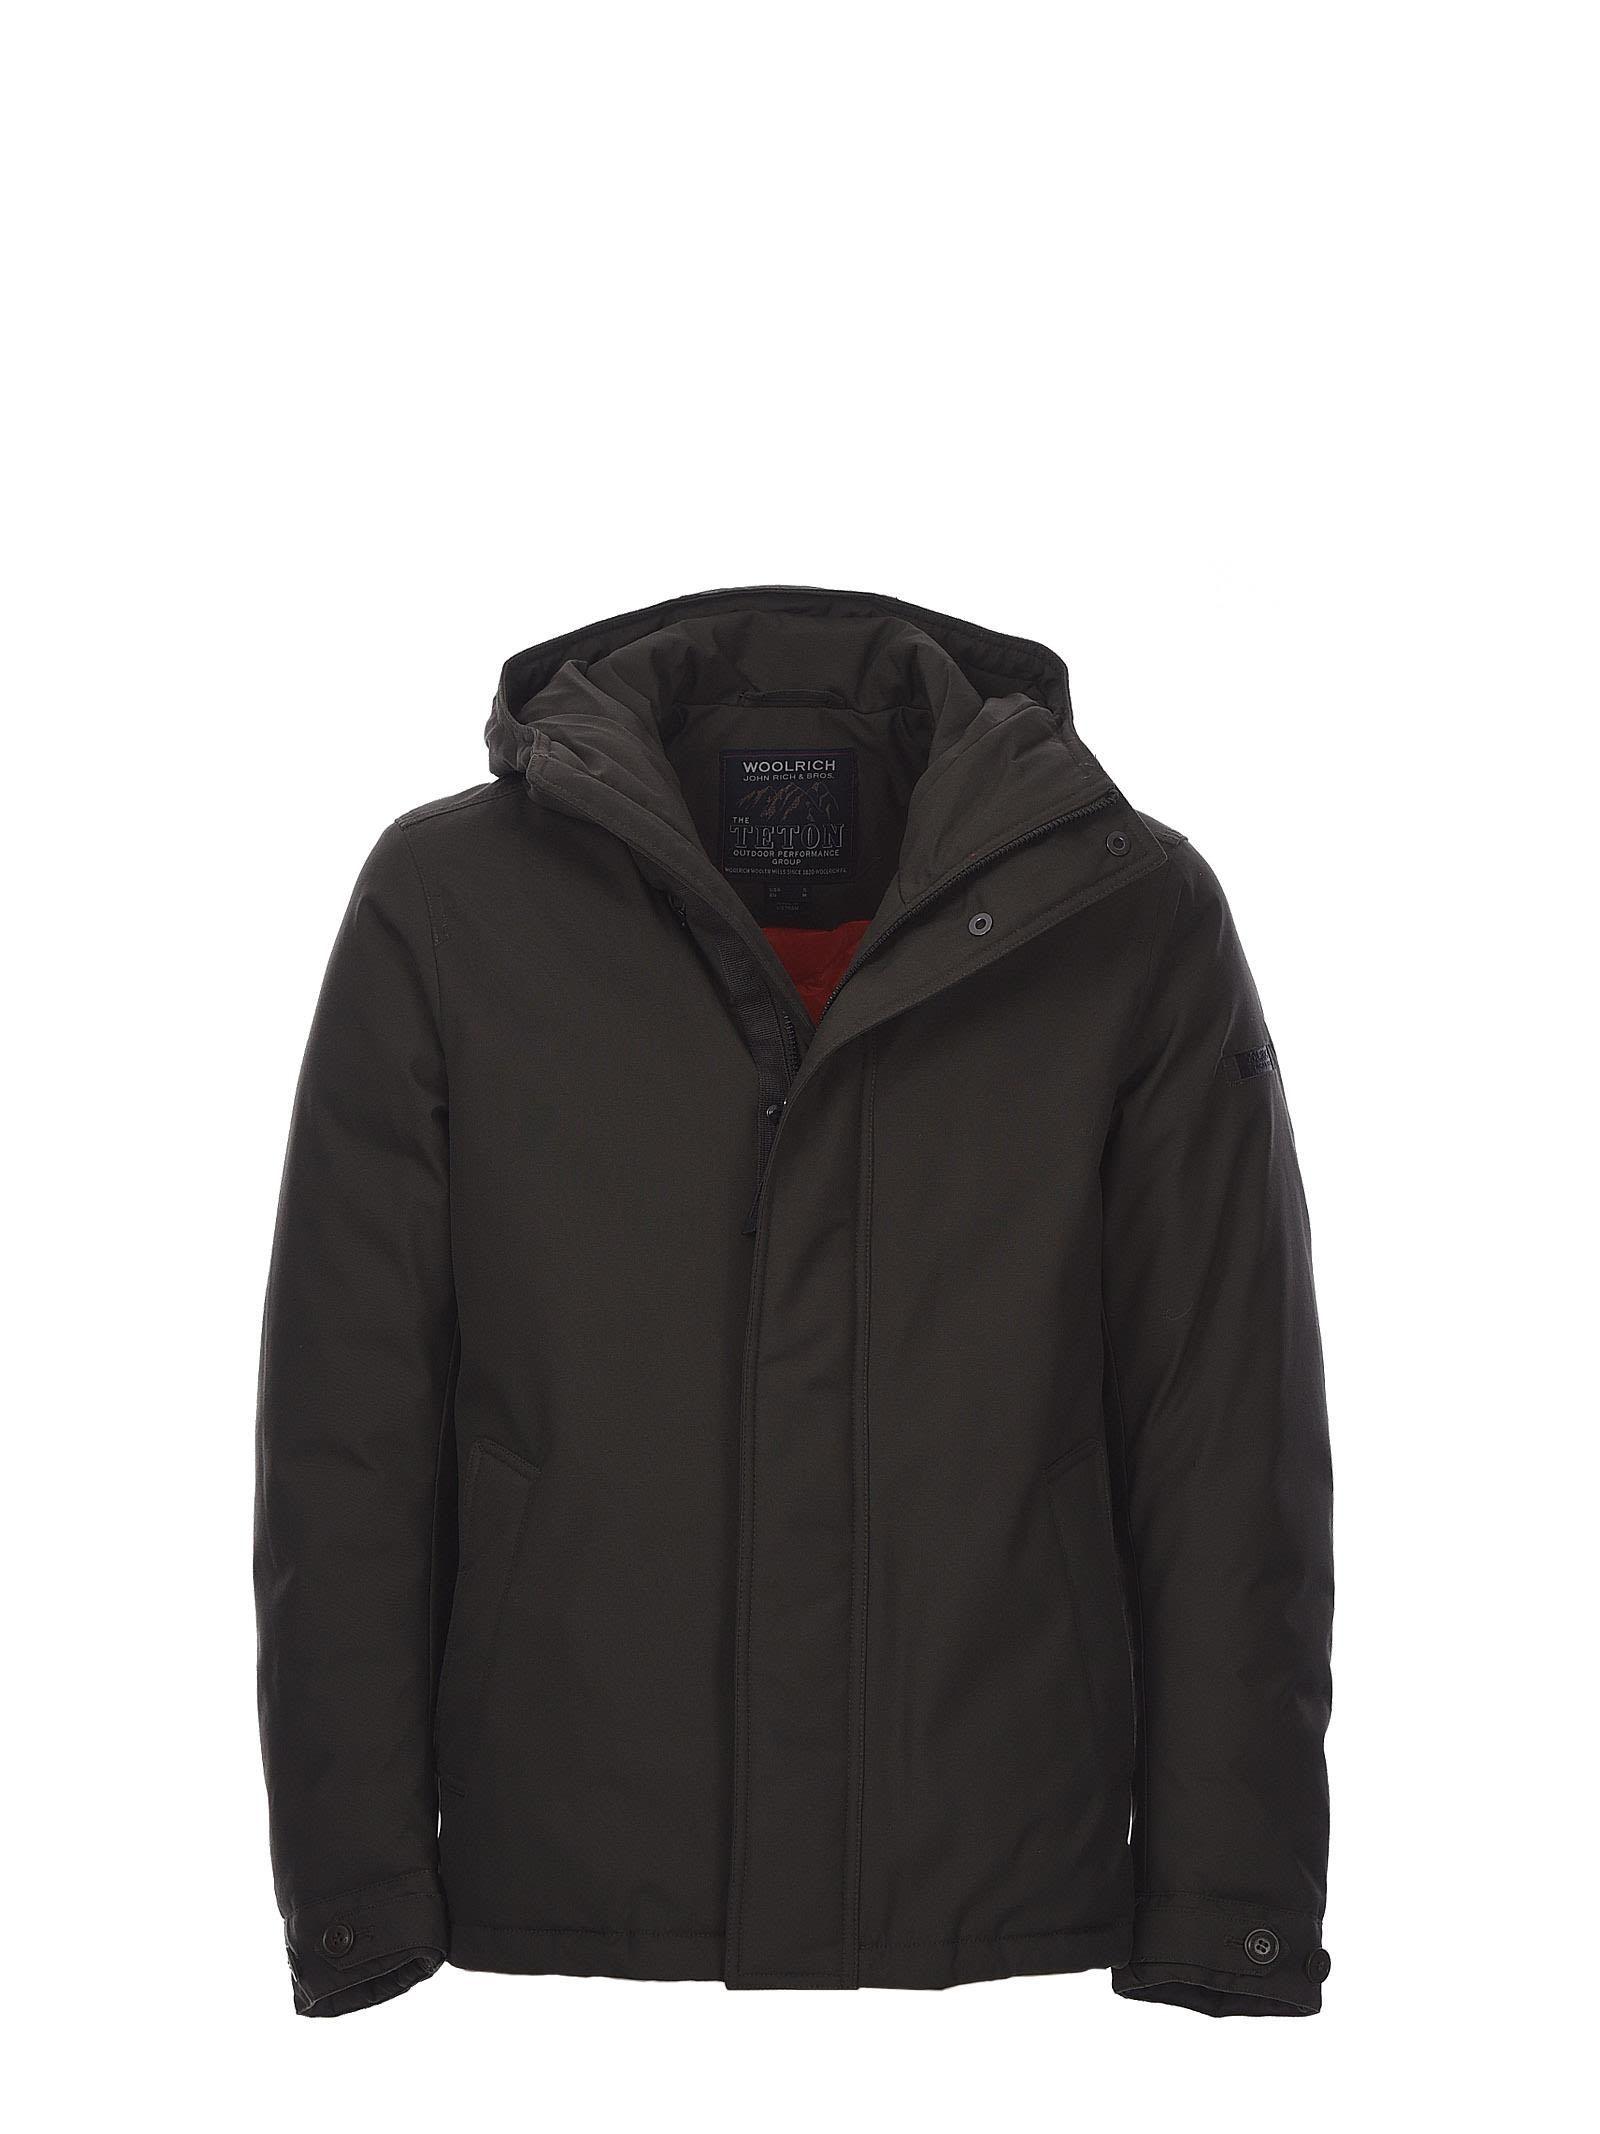 teton rudder jacket  Teton Rudder Jacket Green, Verde   Pinterest